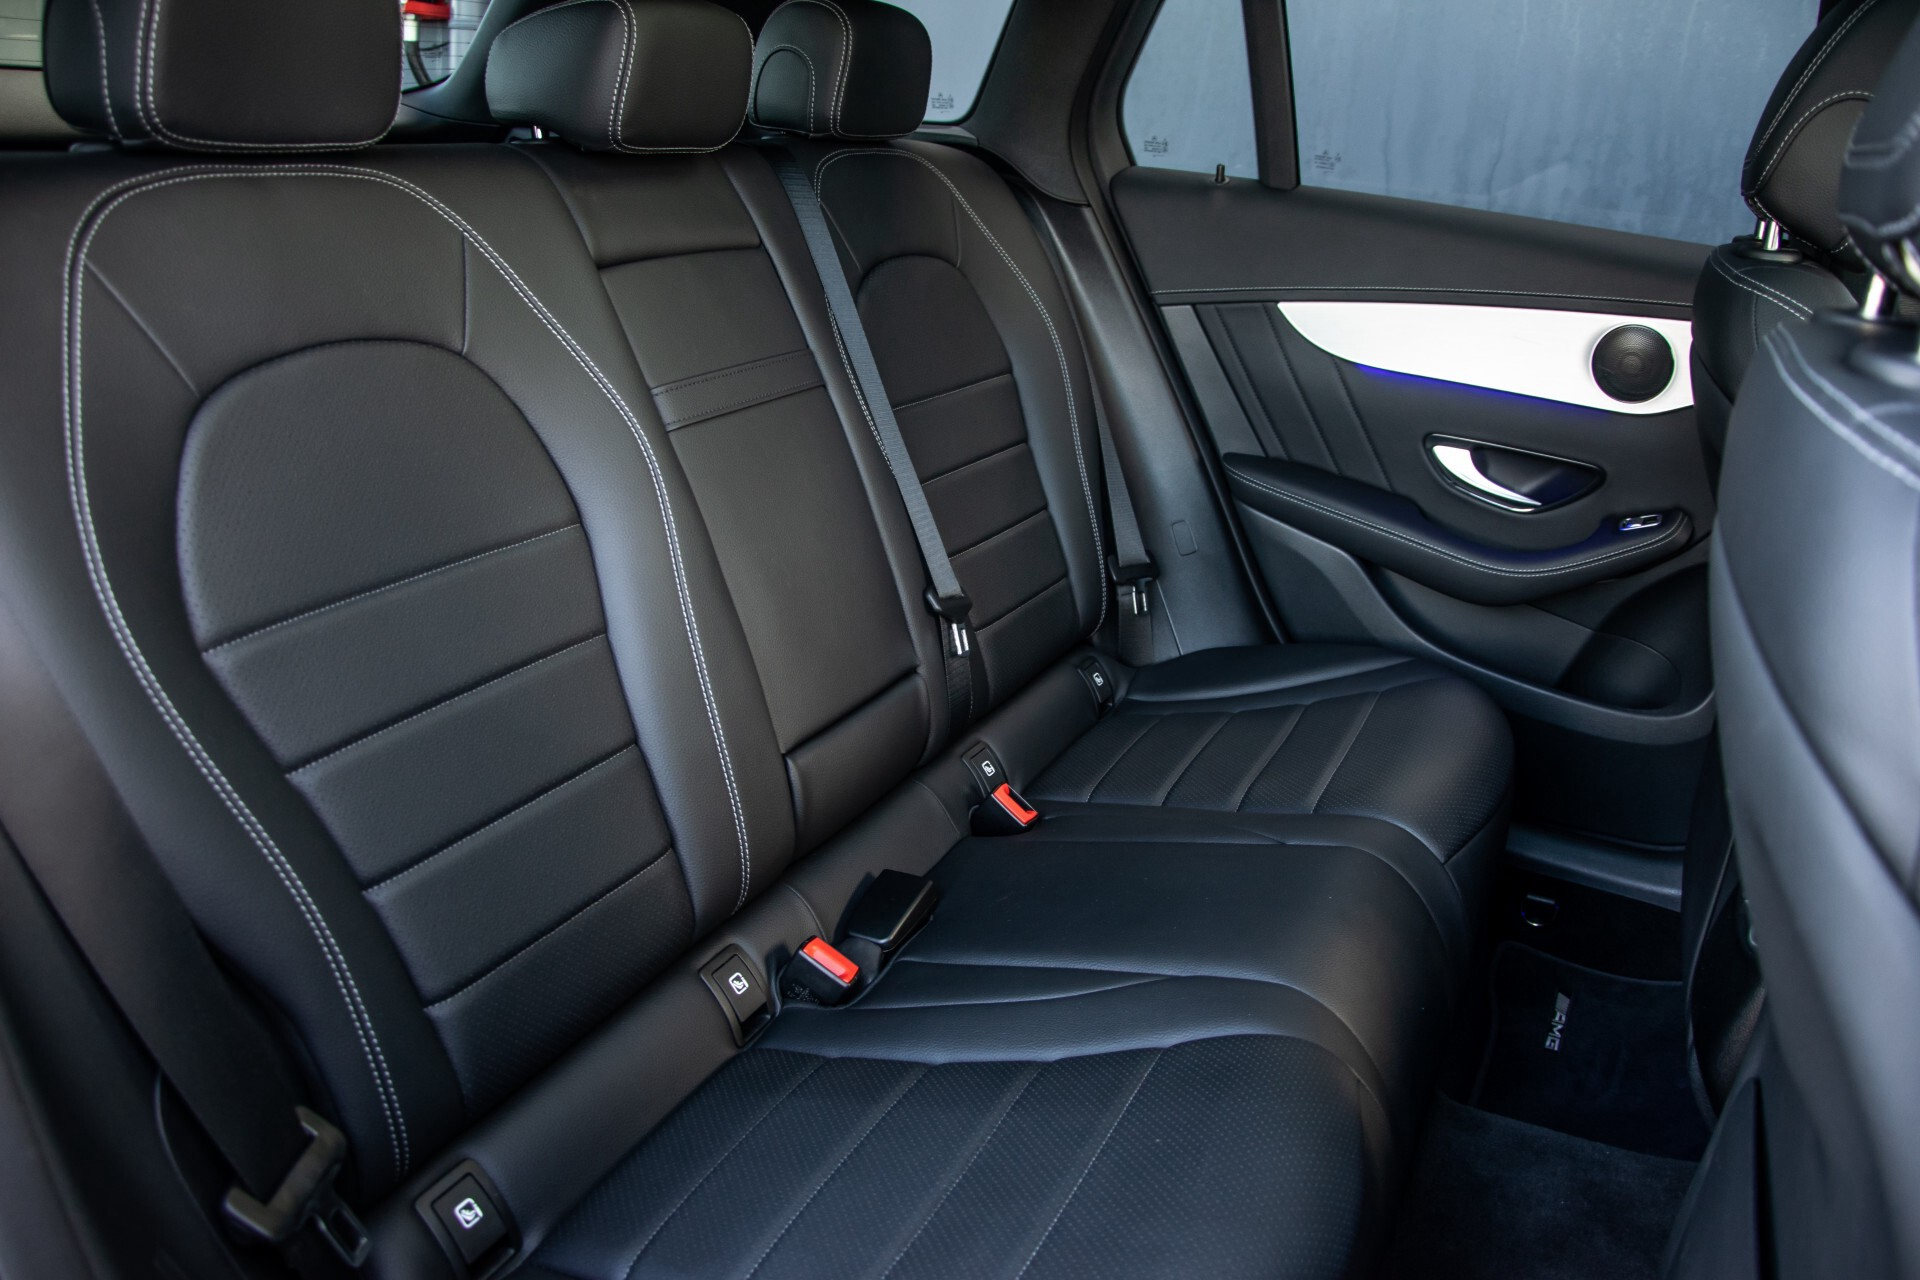 Mercedes-Benz GLC 300 4-M AMG Panorama/Keyless/Assistentiepakket/MBUX//Wegkl-trekhaak Aut9 Foto 5